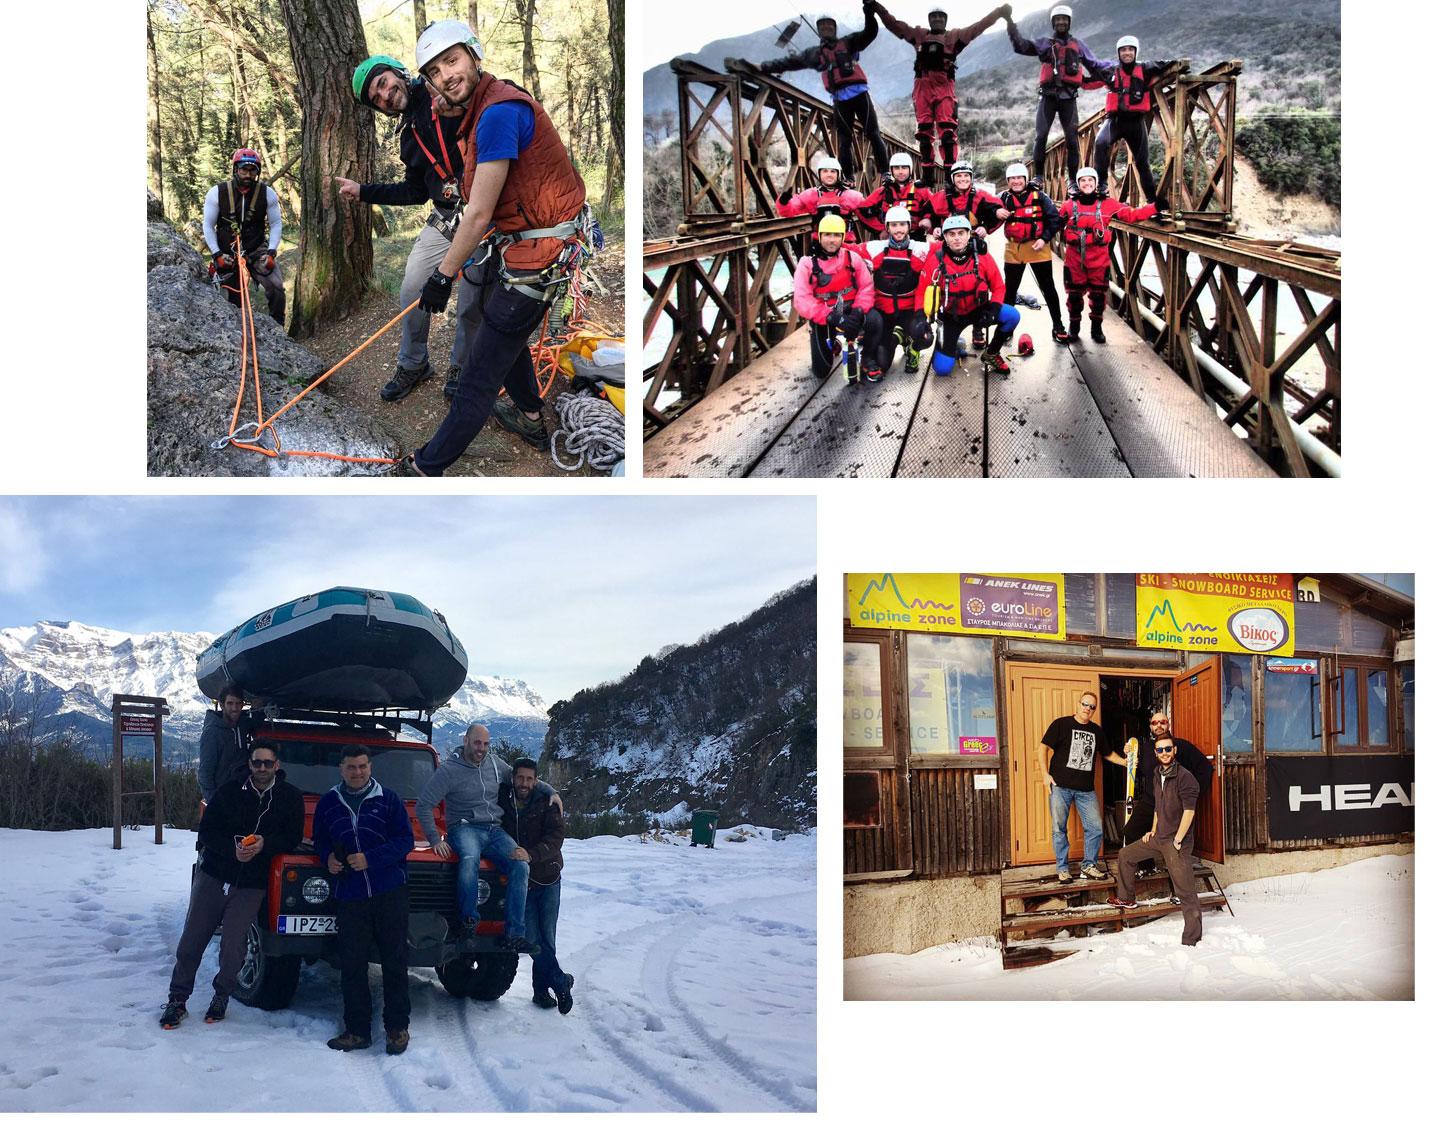 9a07505dd63 Στο ημερήσιο μάθημα ski ή snowboard δεν υπάρχει περιορισμός ατόμων, ούτε  και περιορισμός στις ώρες καθώς είναι δική σας επιλογή. Ο δάσκαλος είναι  ολόκληρη ...